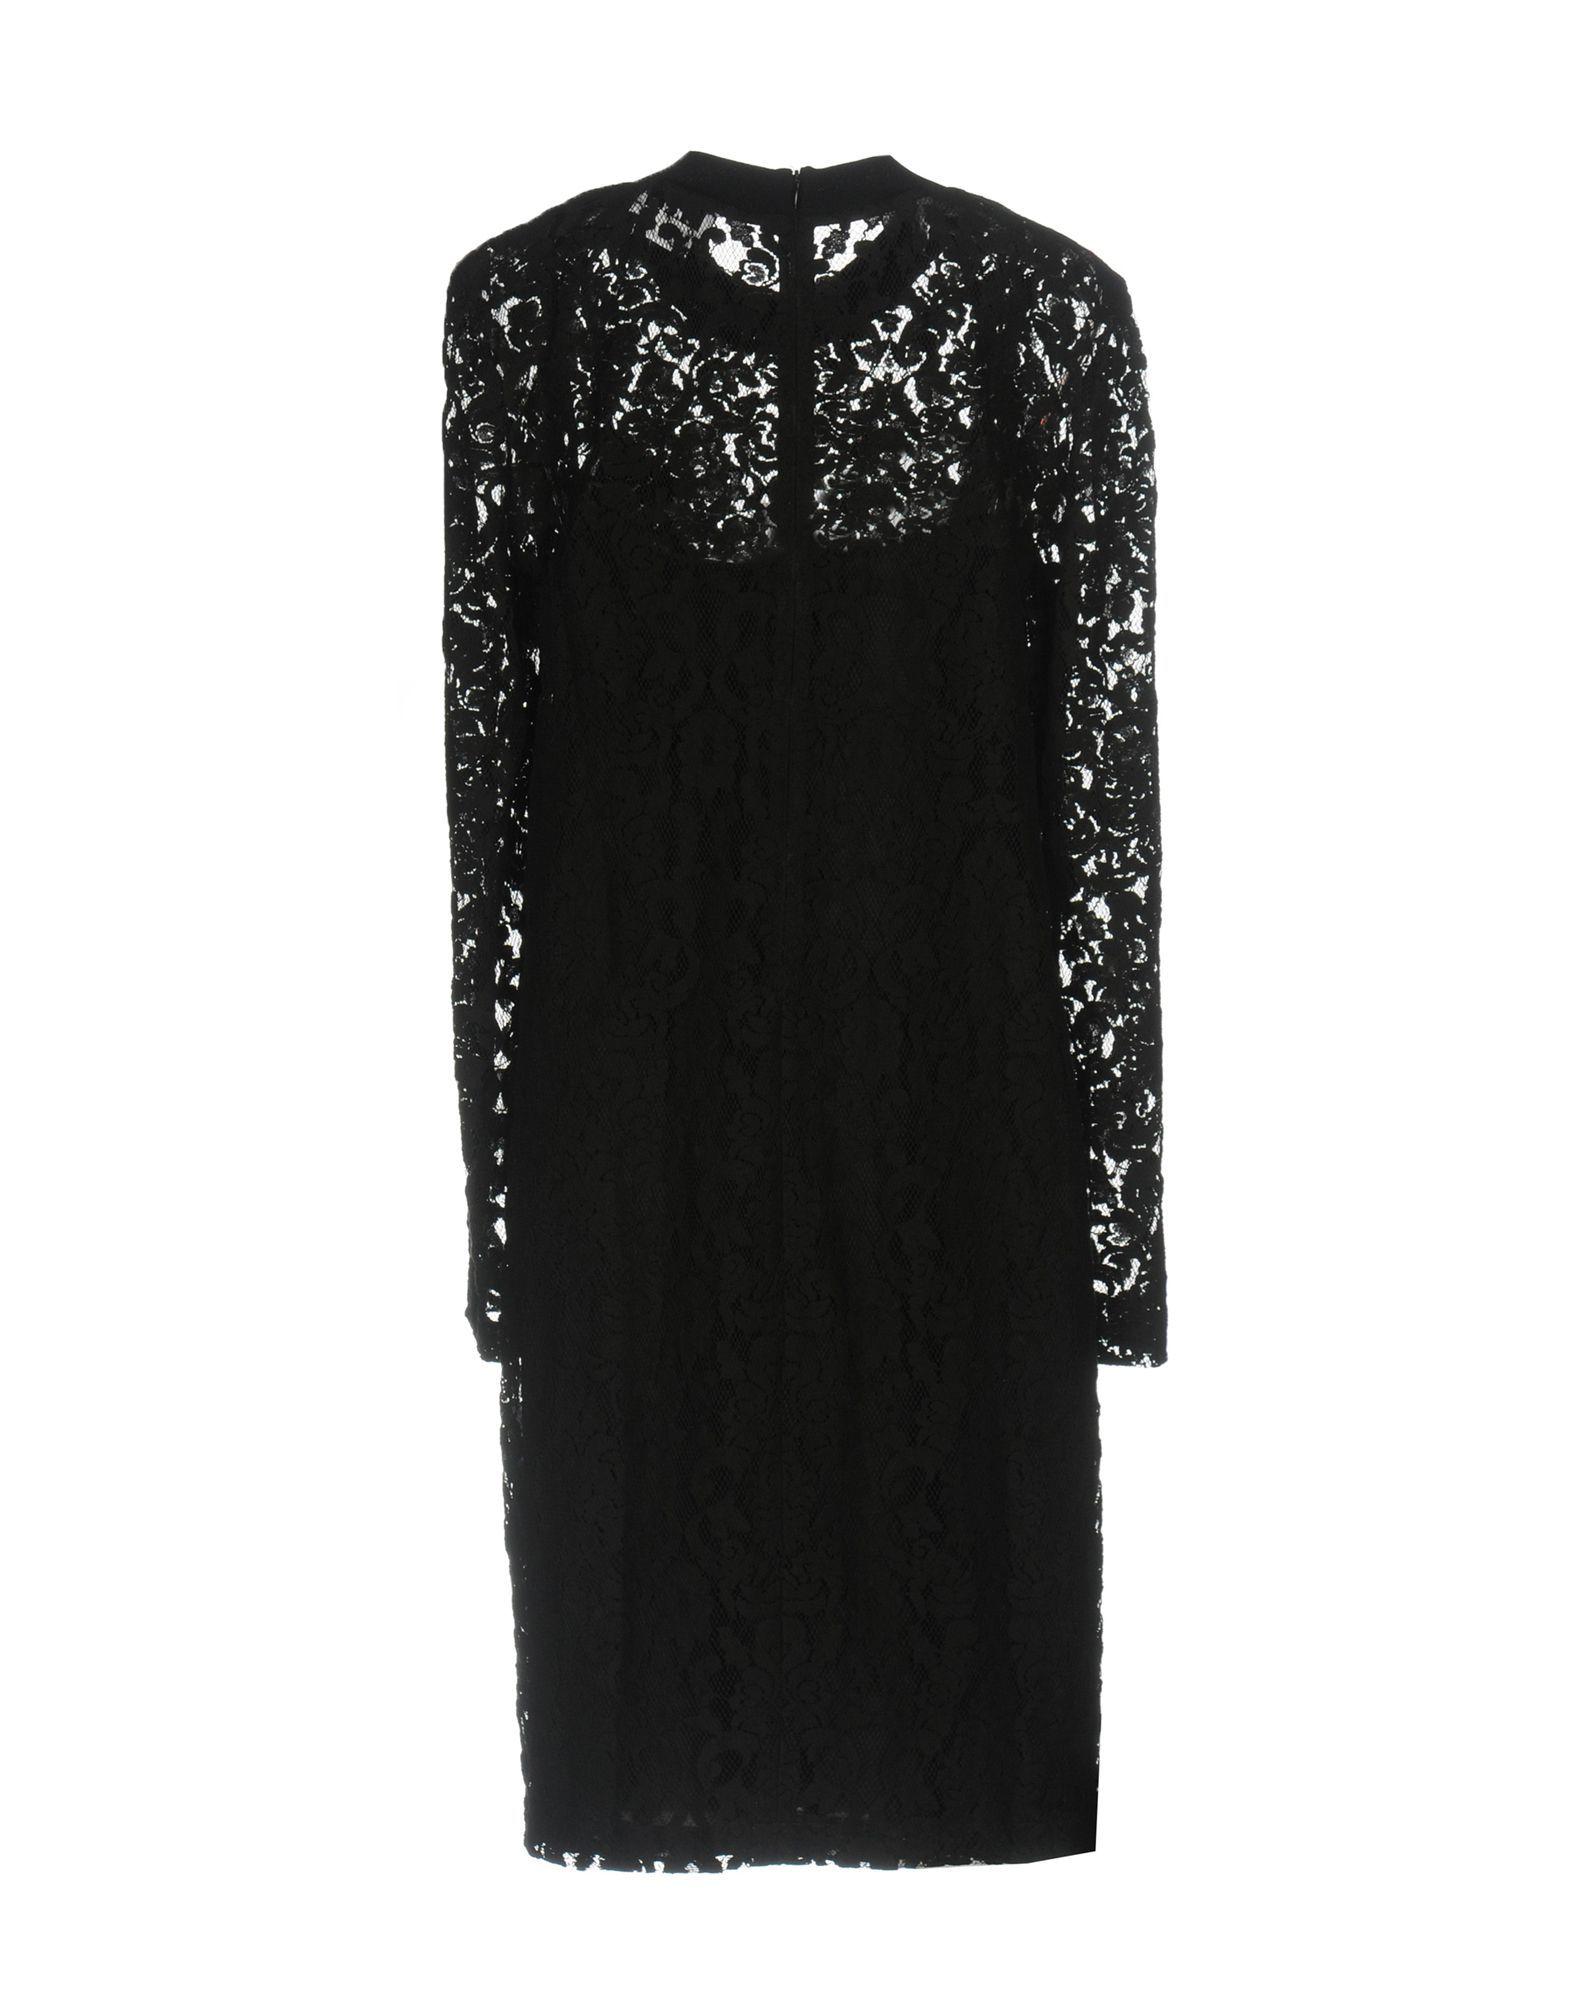 DKNY Black Cotton Lace Long Sleeve Dress